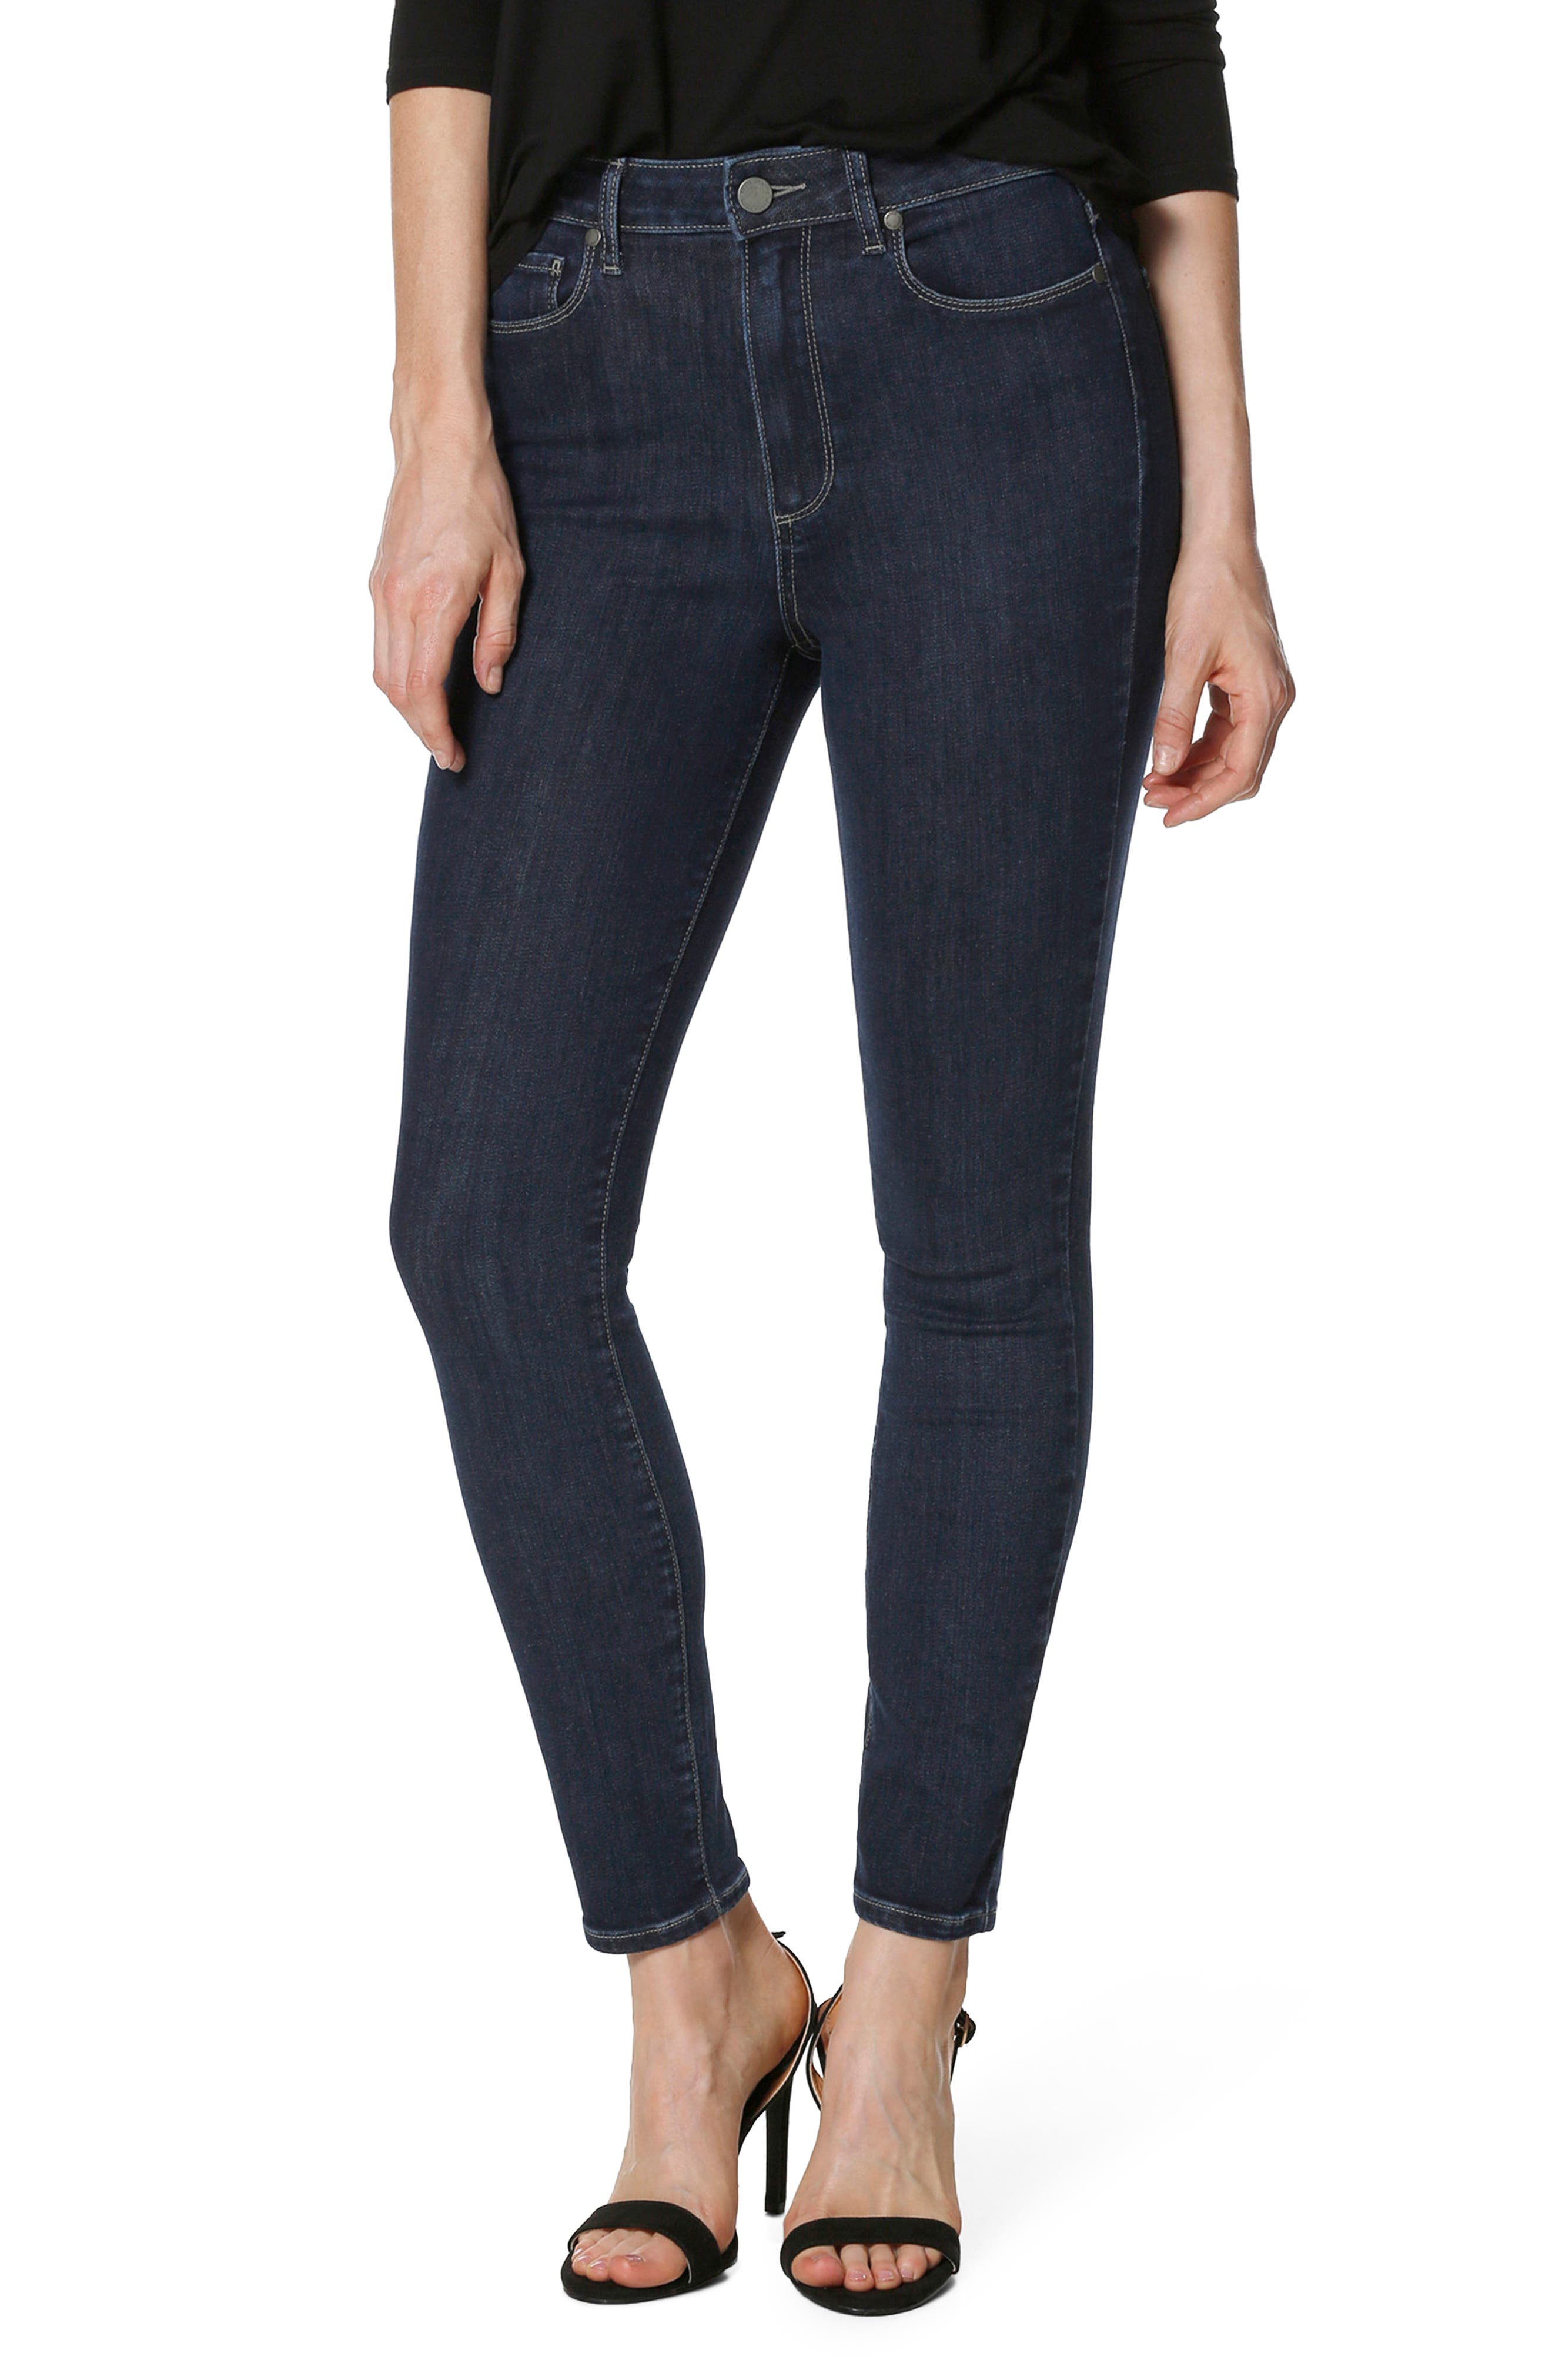 Transcend Vintage - Margot High Waist Ankle Ultra Skinny Jeans,                             Main thumbnail 1, color,